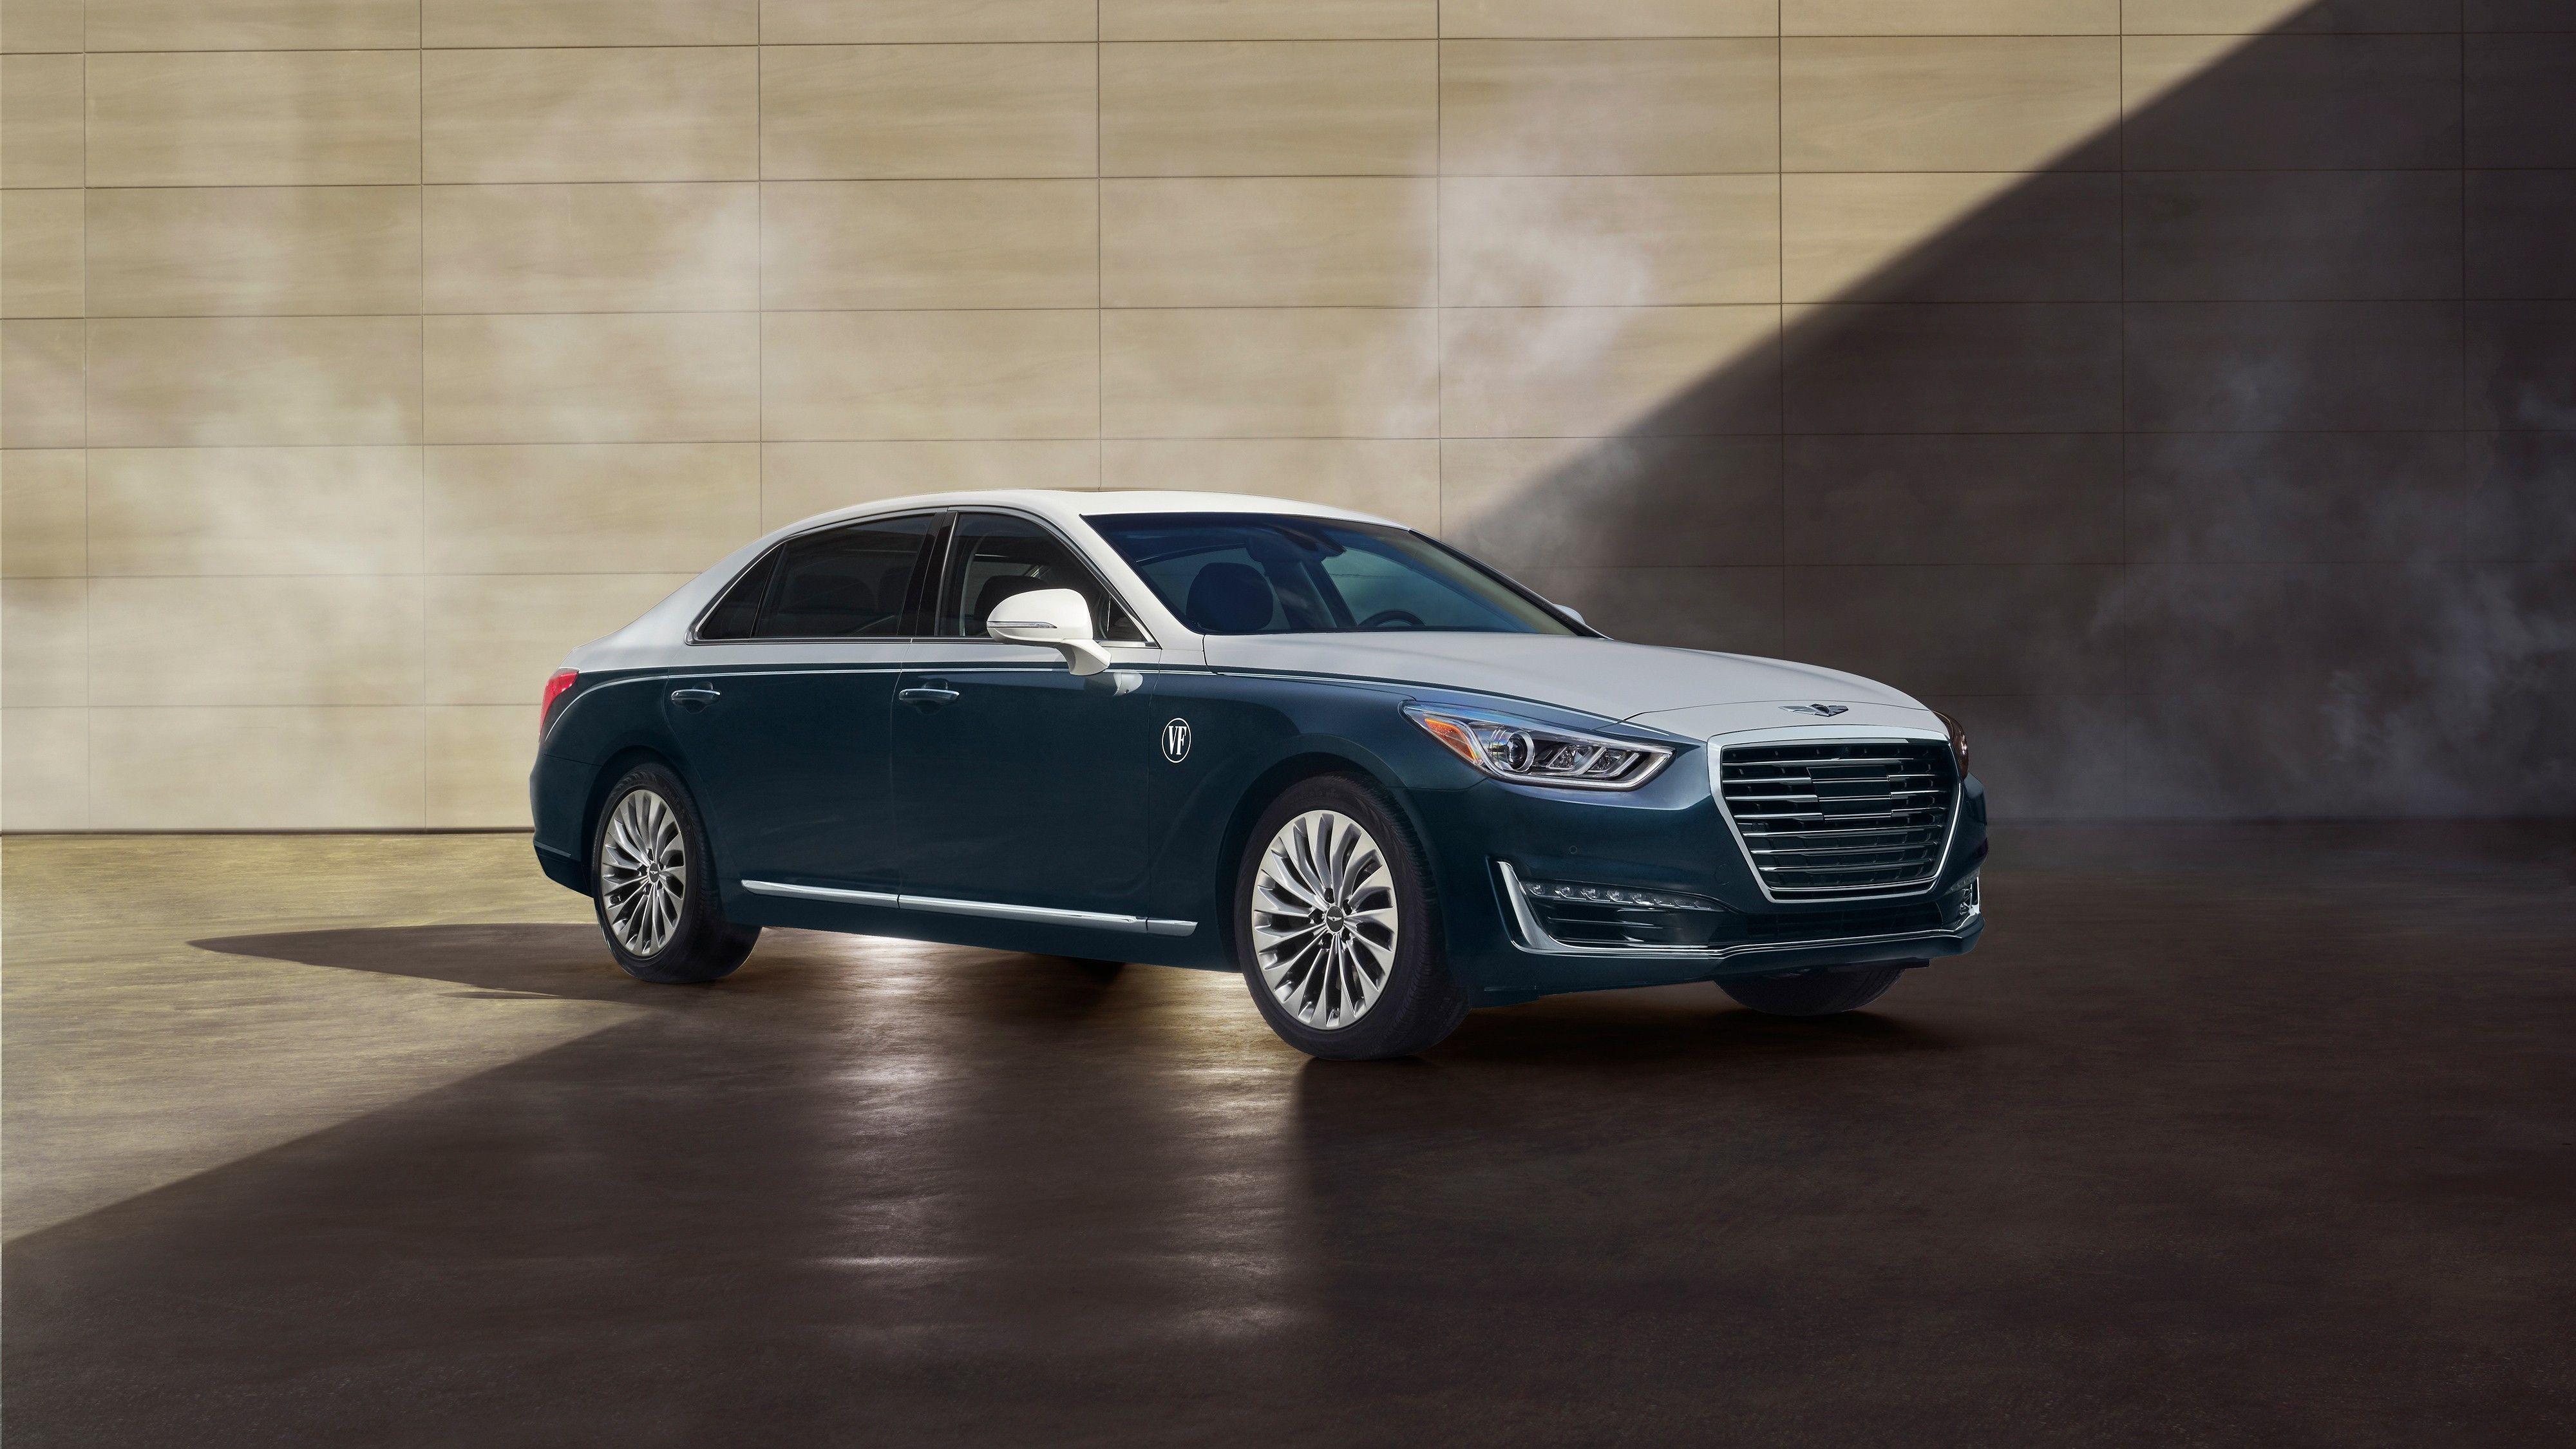 2019 Genesis G90 Price And Release Date Car Gallery Hyundai Genesis Luxury Cars New Cars